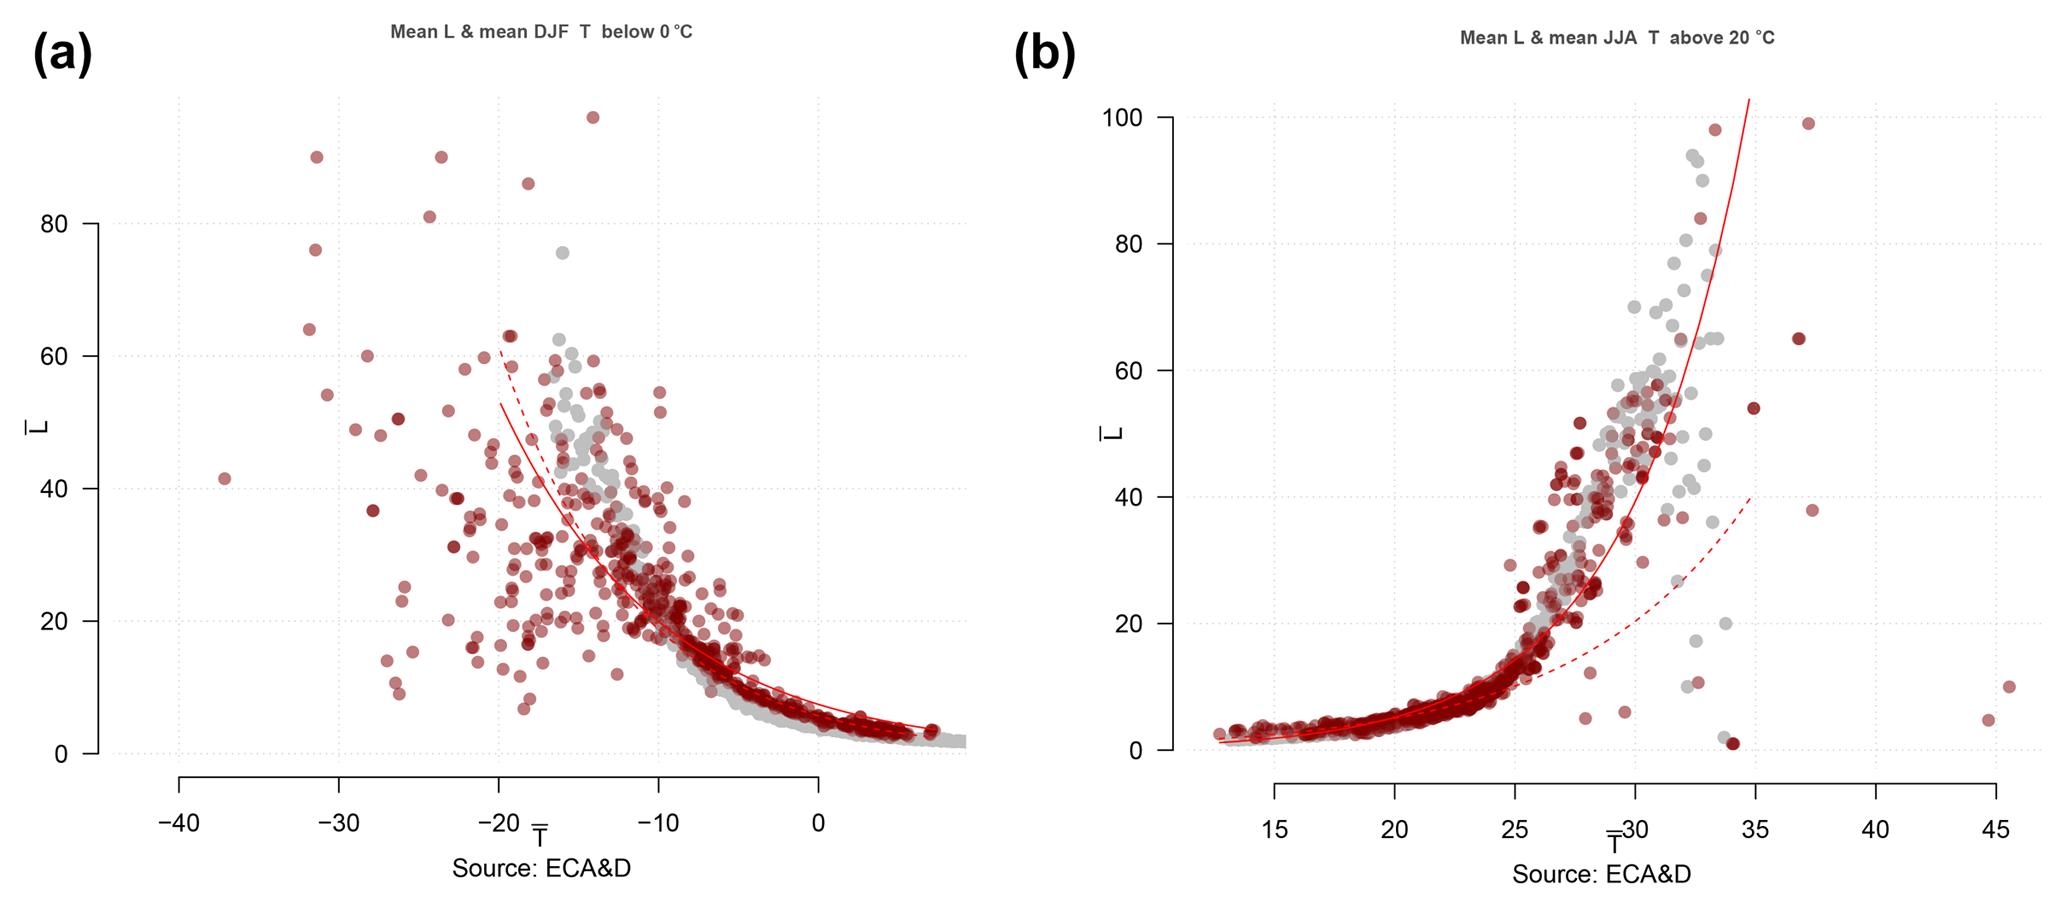 ASCMO - Downscaling probability of long heatwaves based on